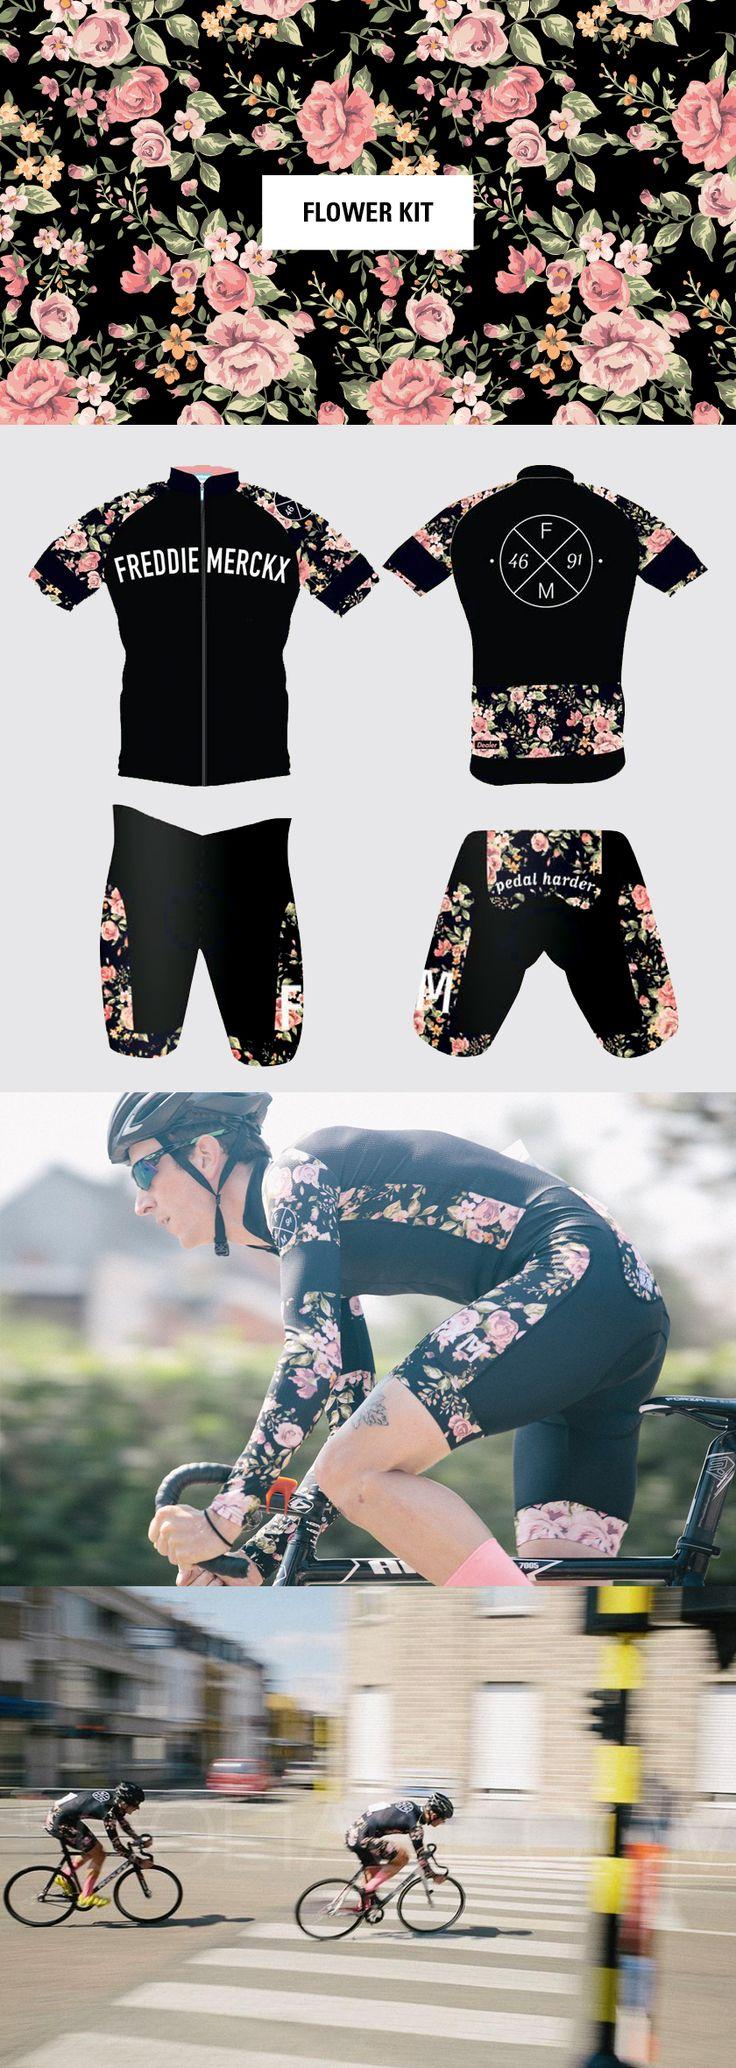 Freddie Merckx – Flower Kit https://www.facebook.com/fxmpedalharder